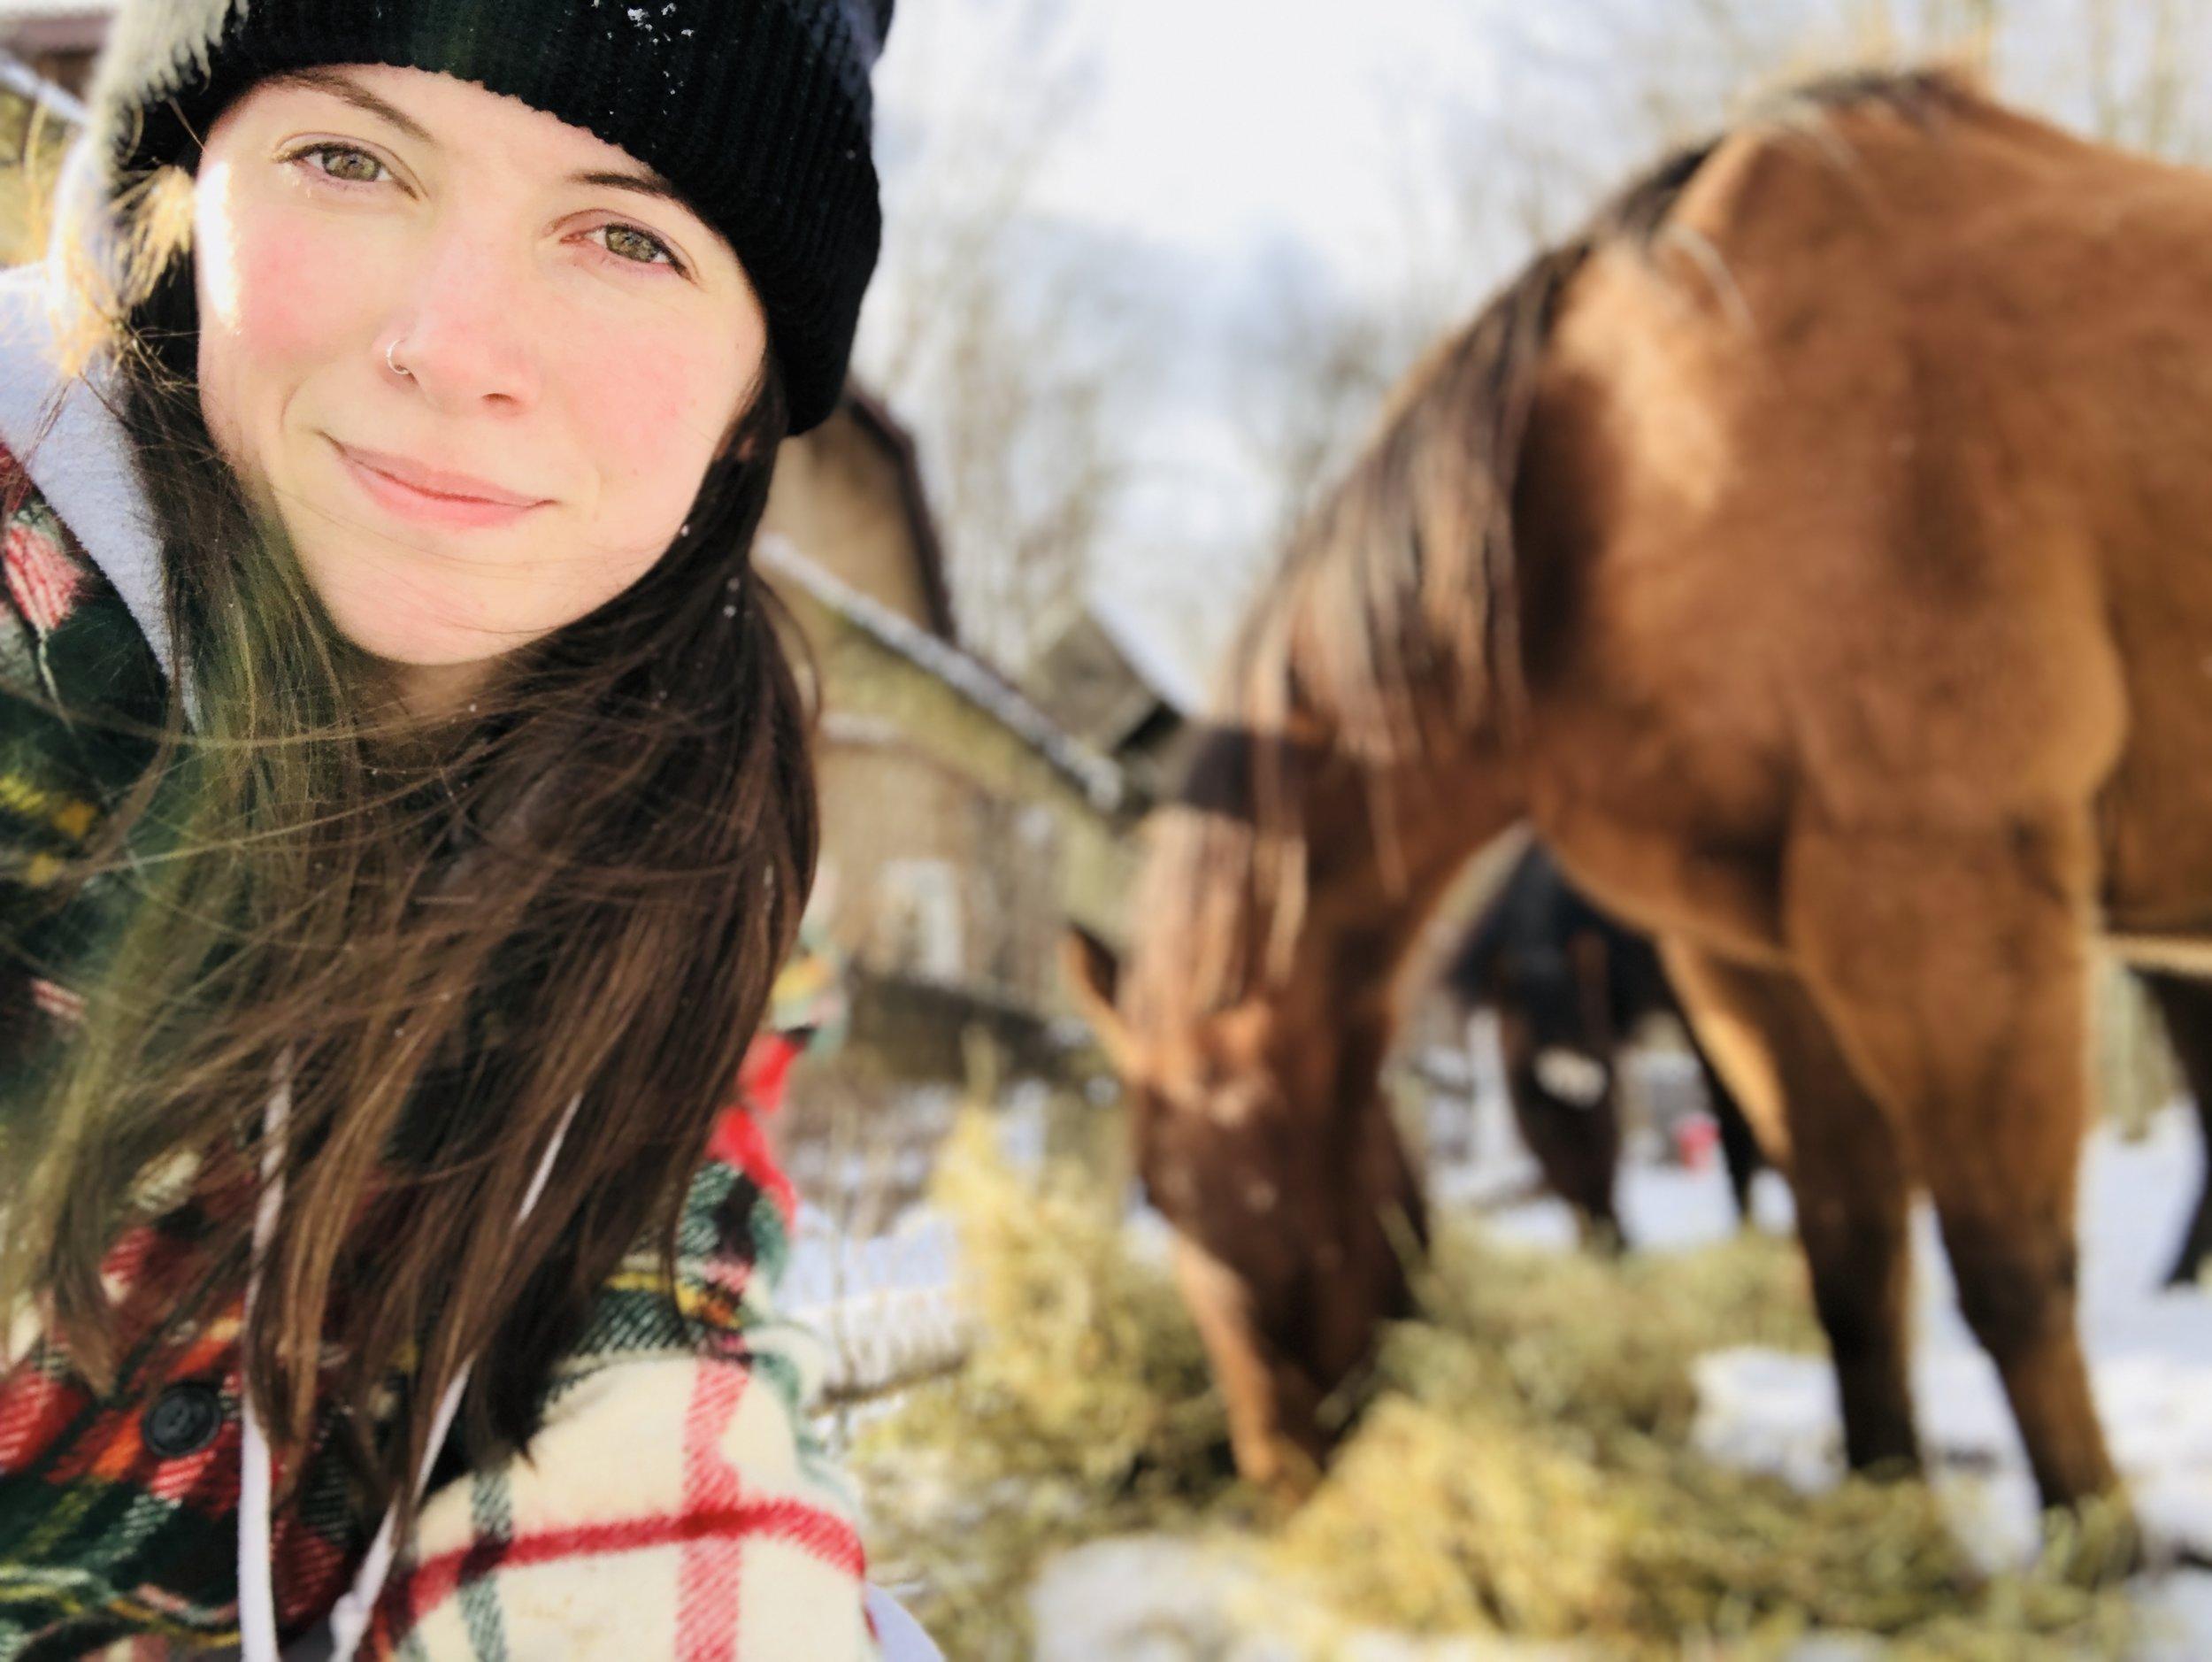 Ashley at her family's farm in Pennsylvania